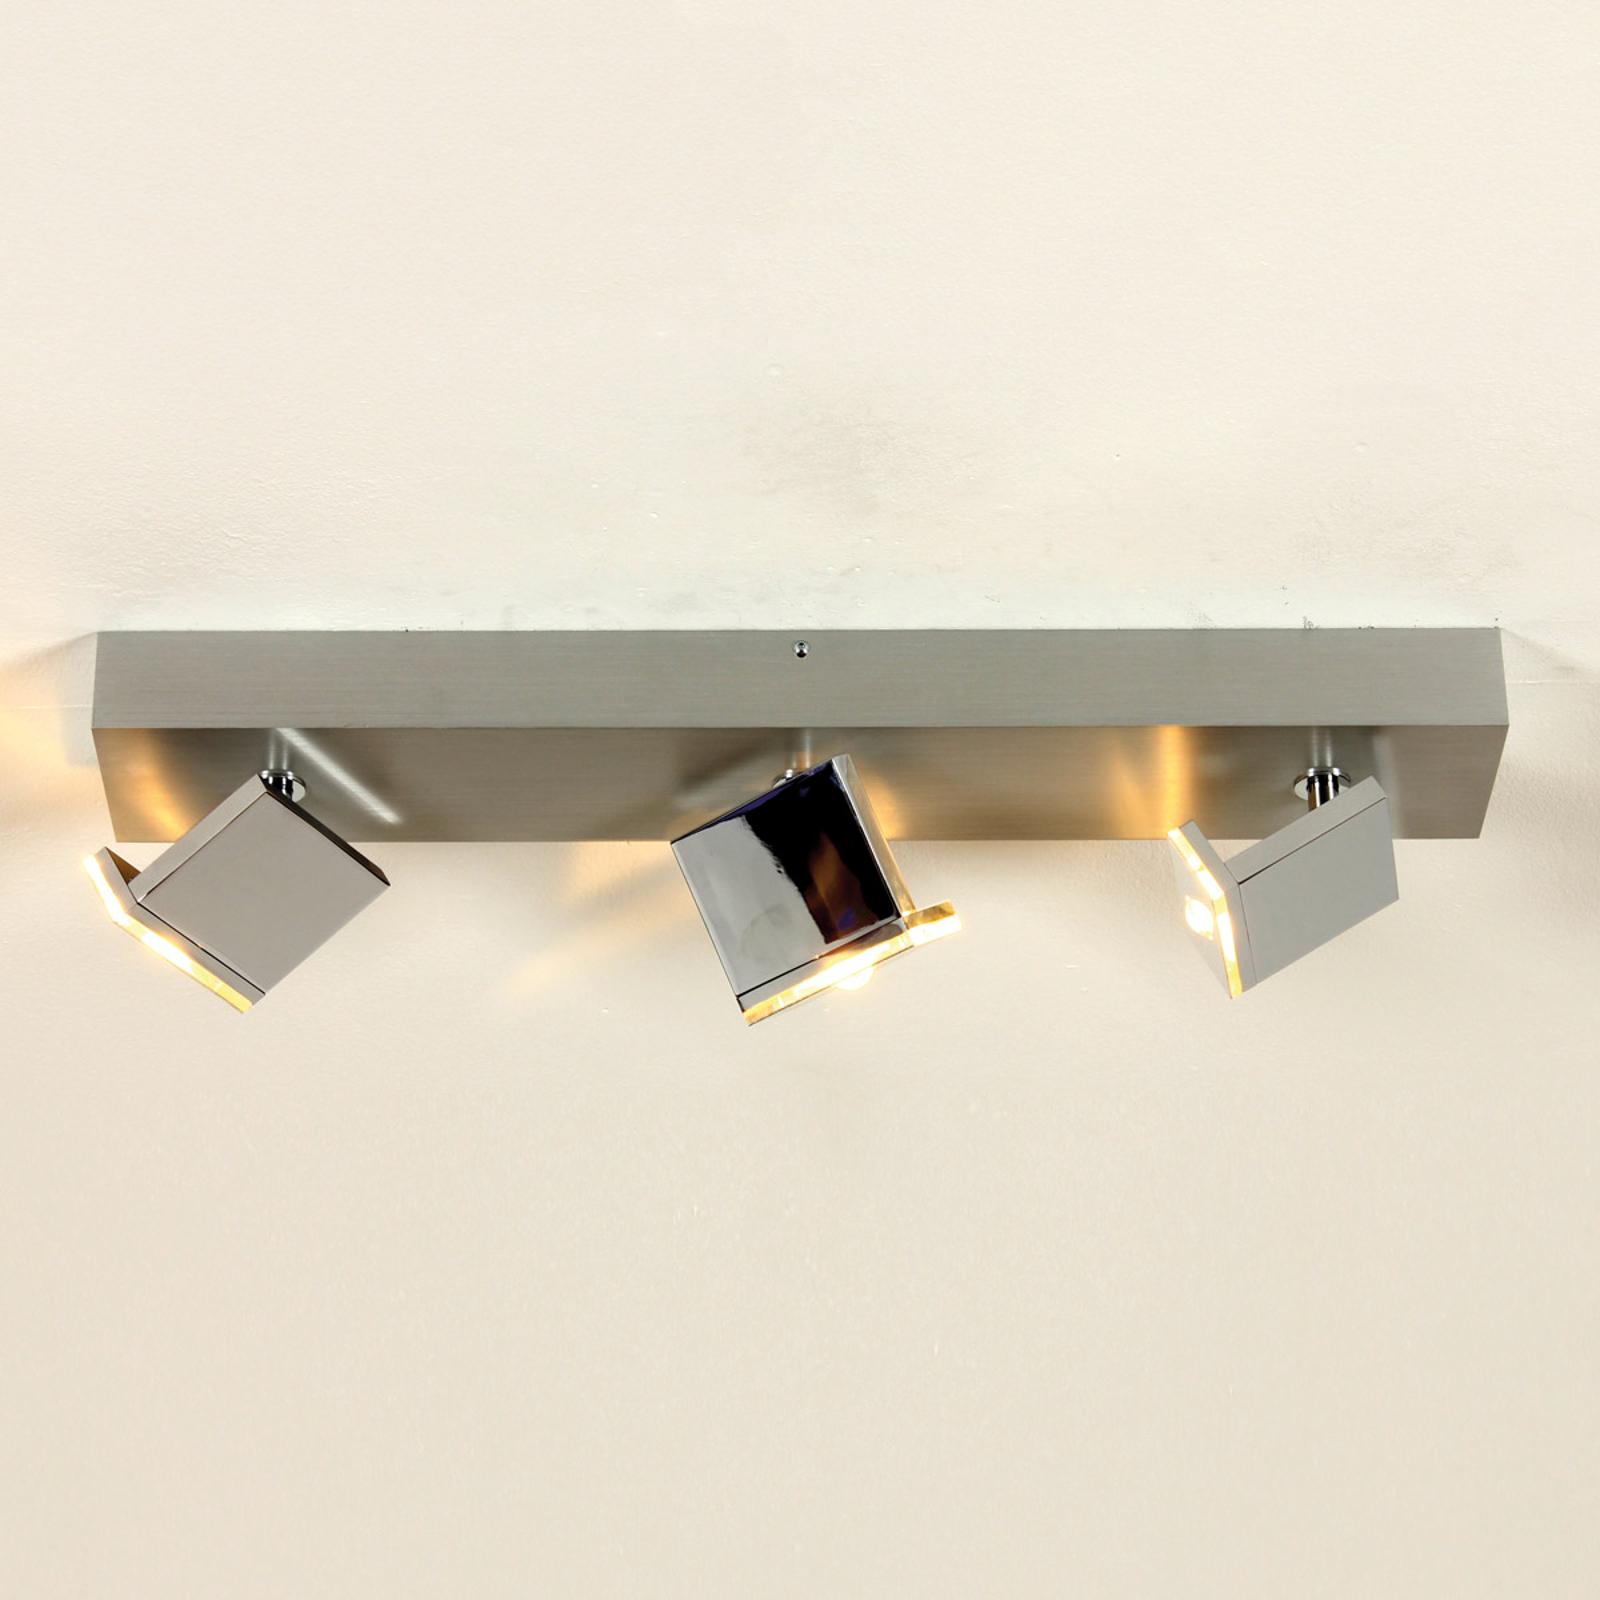 Lámpara LED de techo Elle de 3 brazos, atenuable